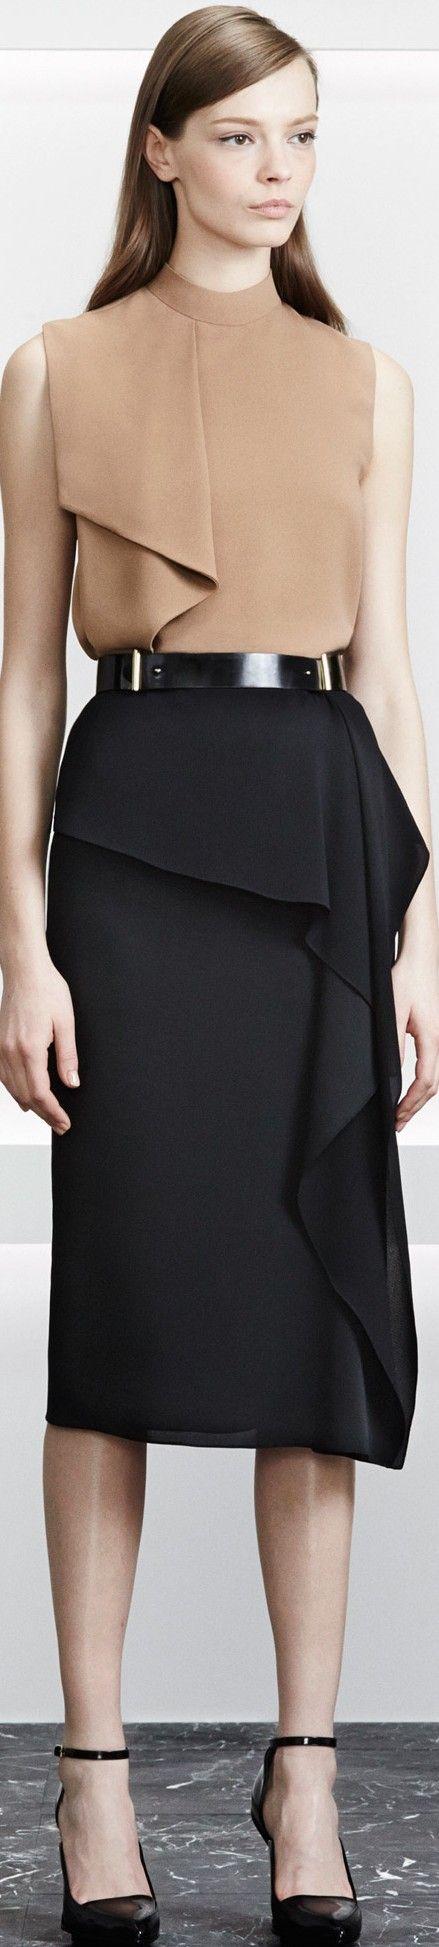 Jason Wu women fashion outfit clothing style apparel @roressclothes closet ideas